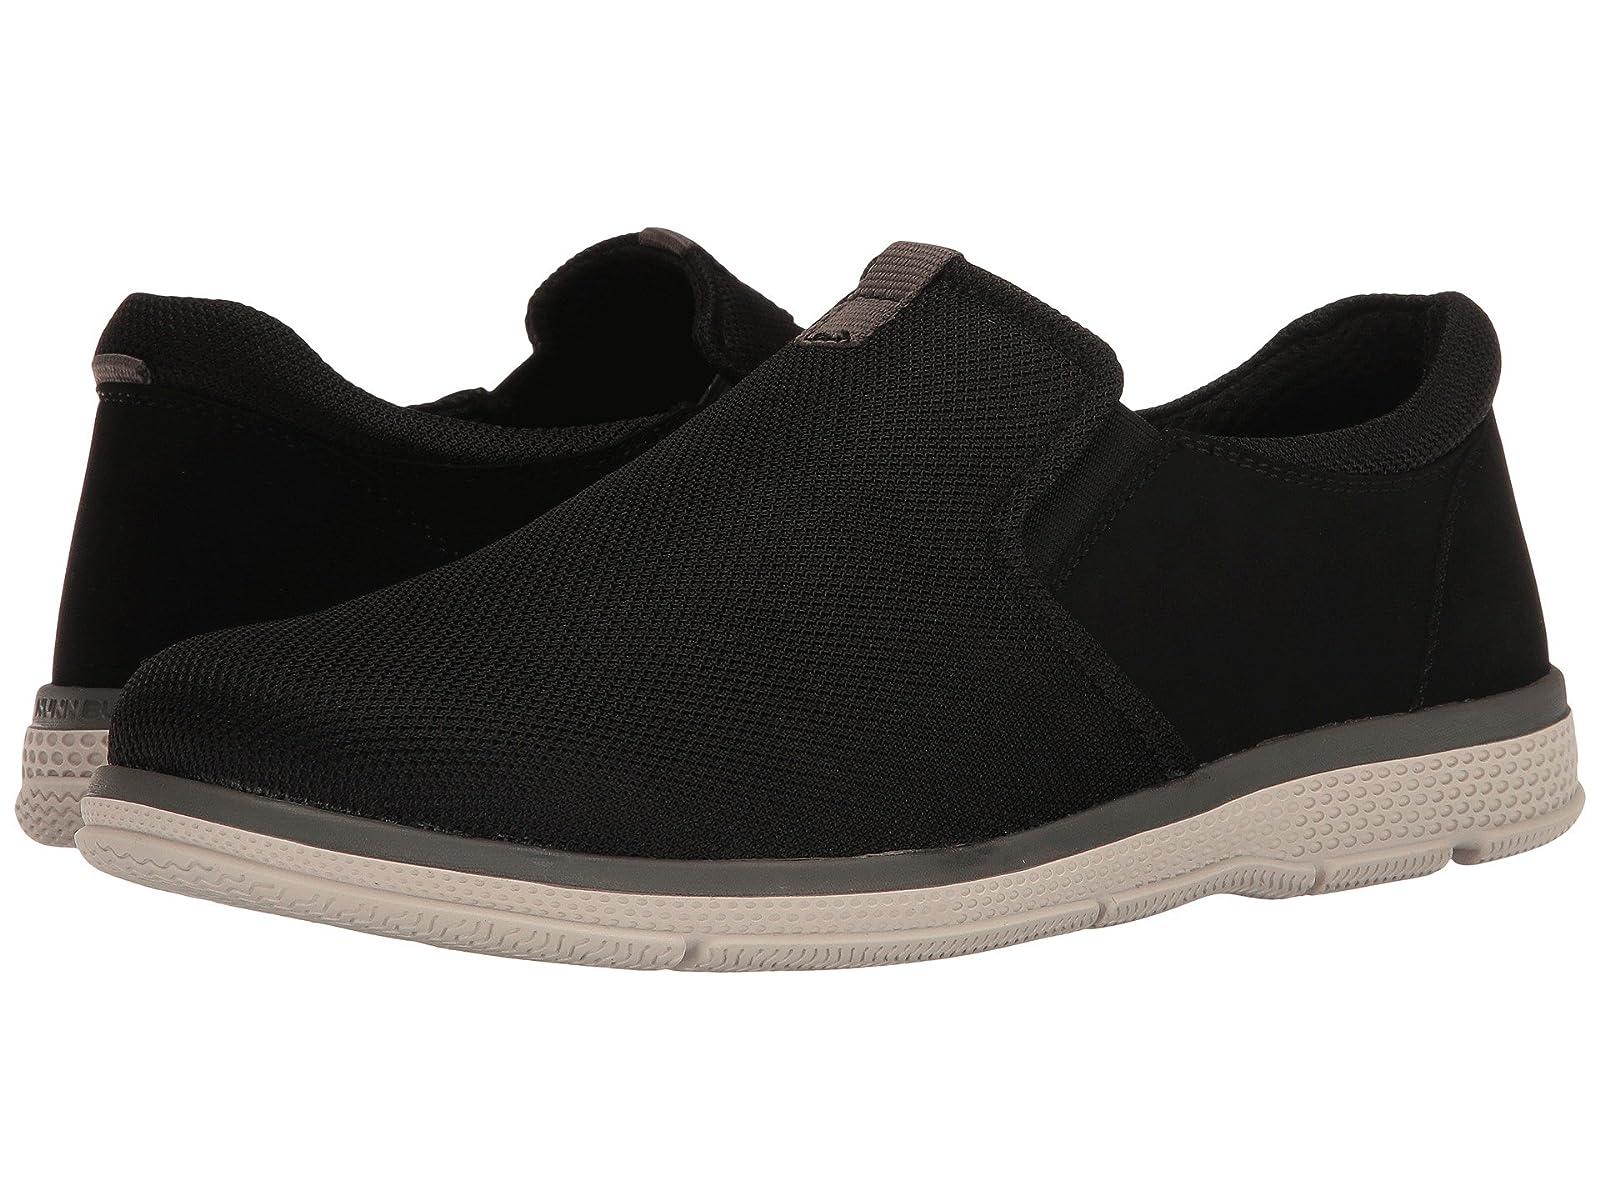 Nunn Bush Zen Plain Toe Slip-OnCheap and distinctive eye-catching shoes